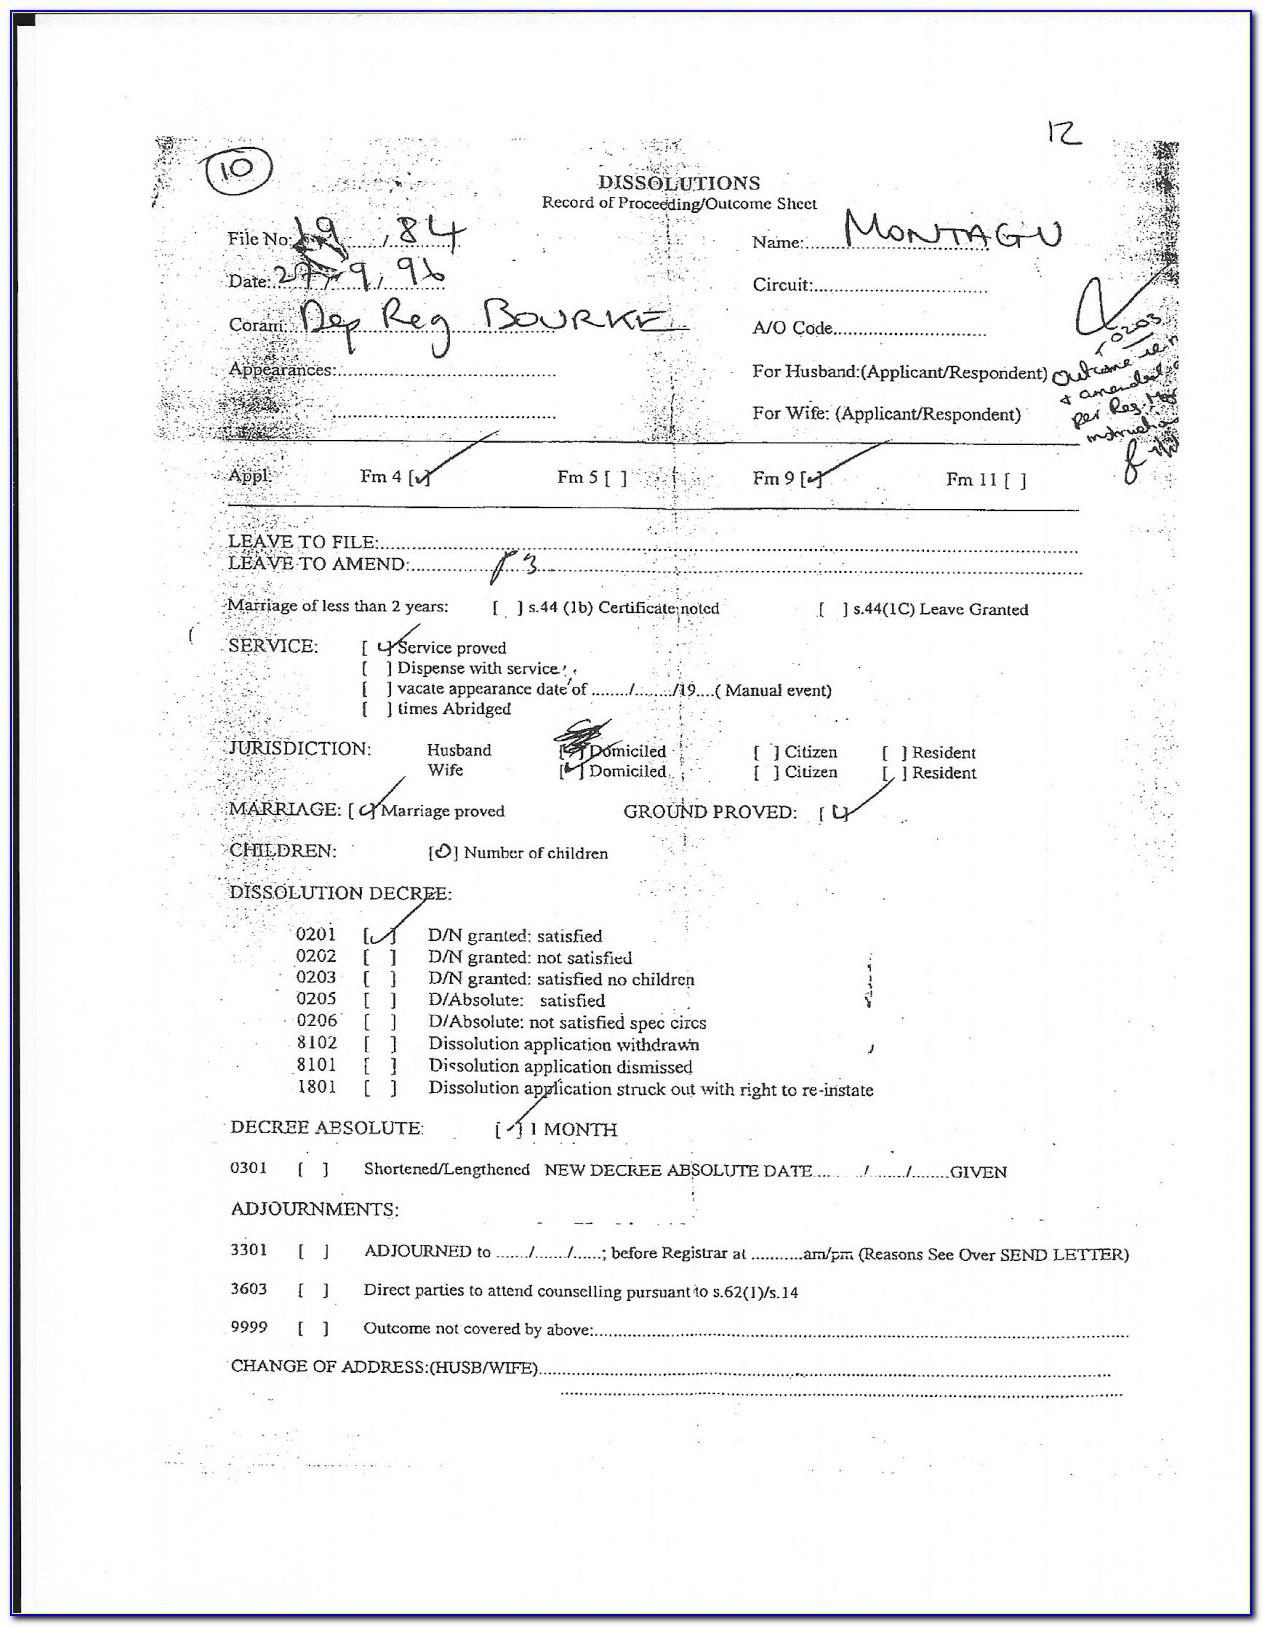 Hawaii Bar Certificate Of Good Standing